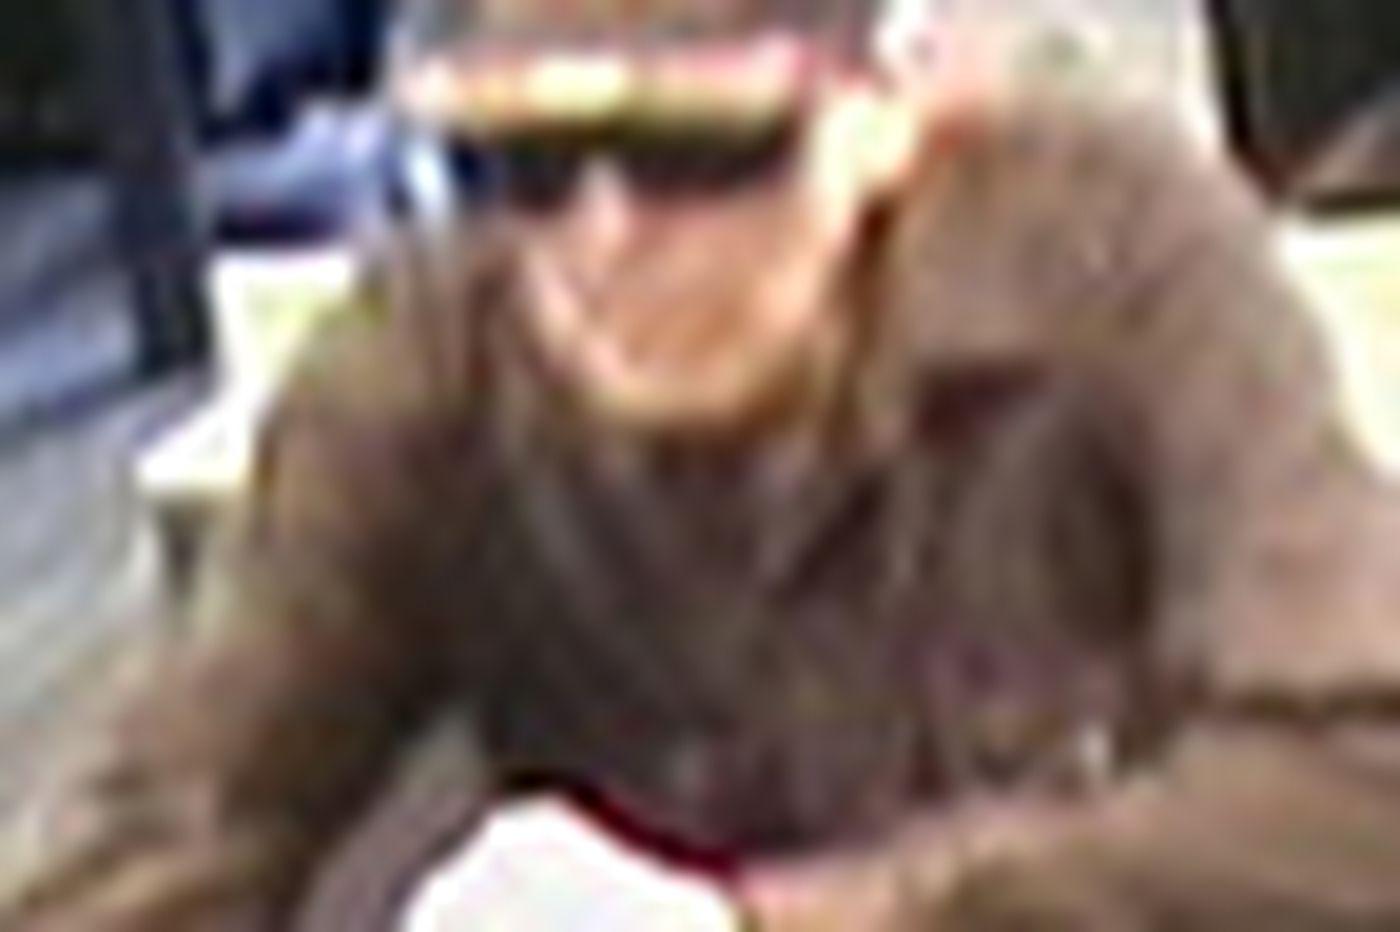 Elderly man sought in bank heist